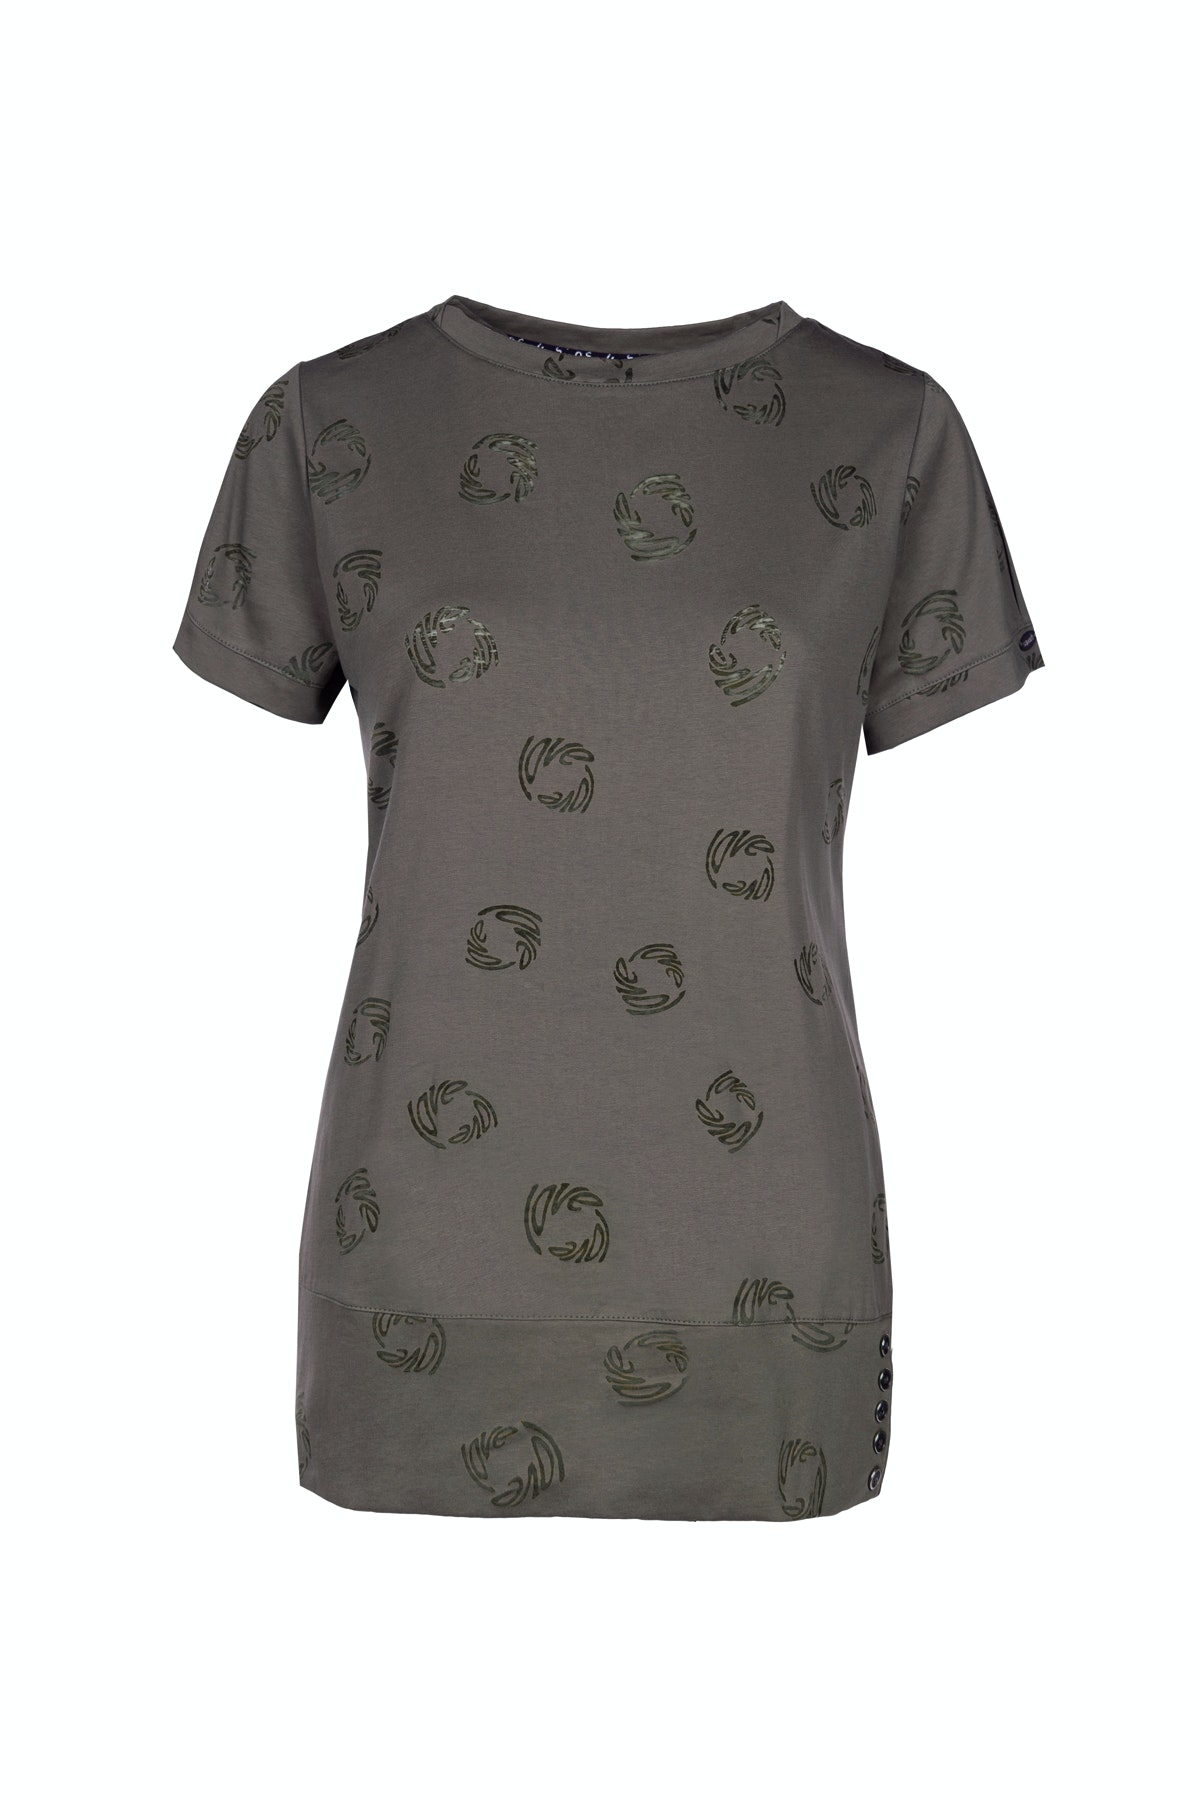 Soquesto Damen Shirt Katy